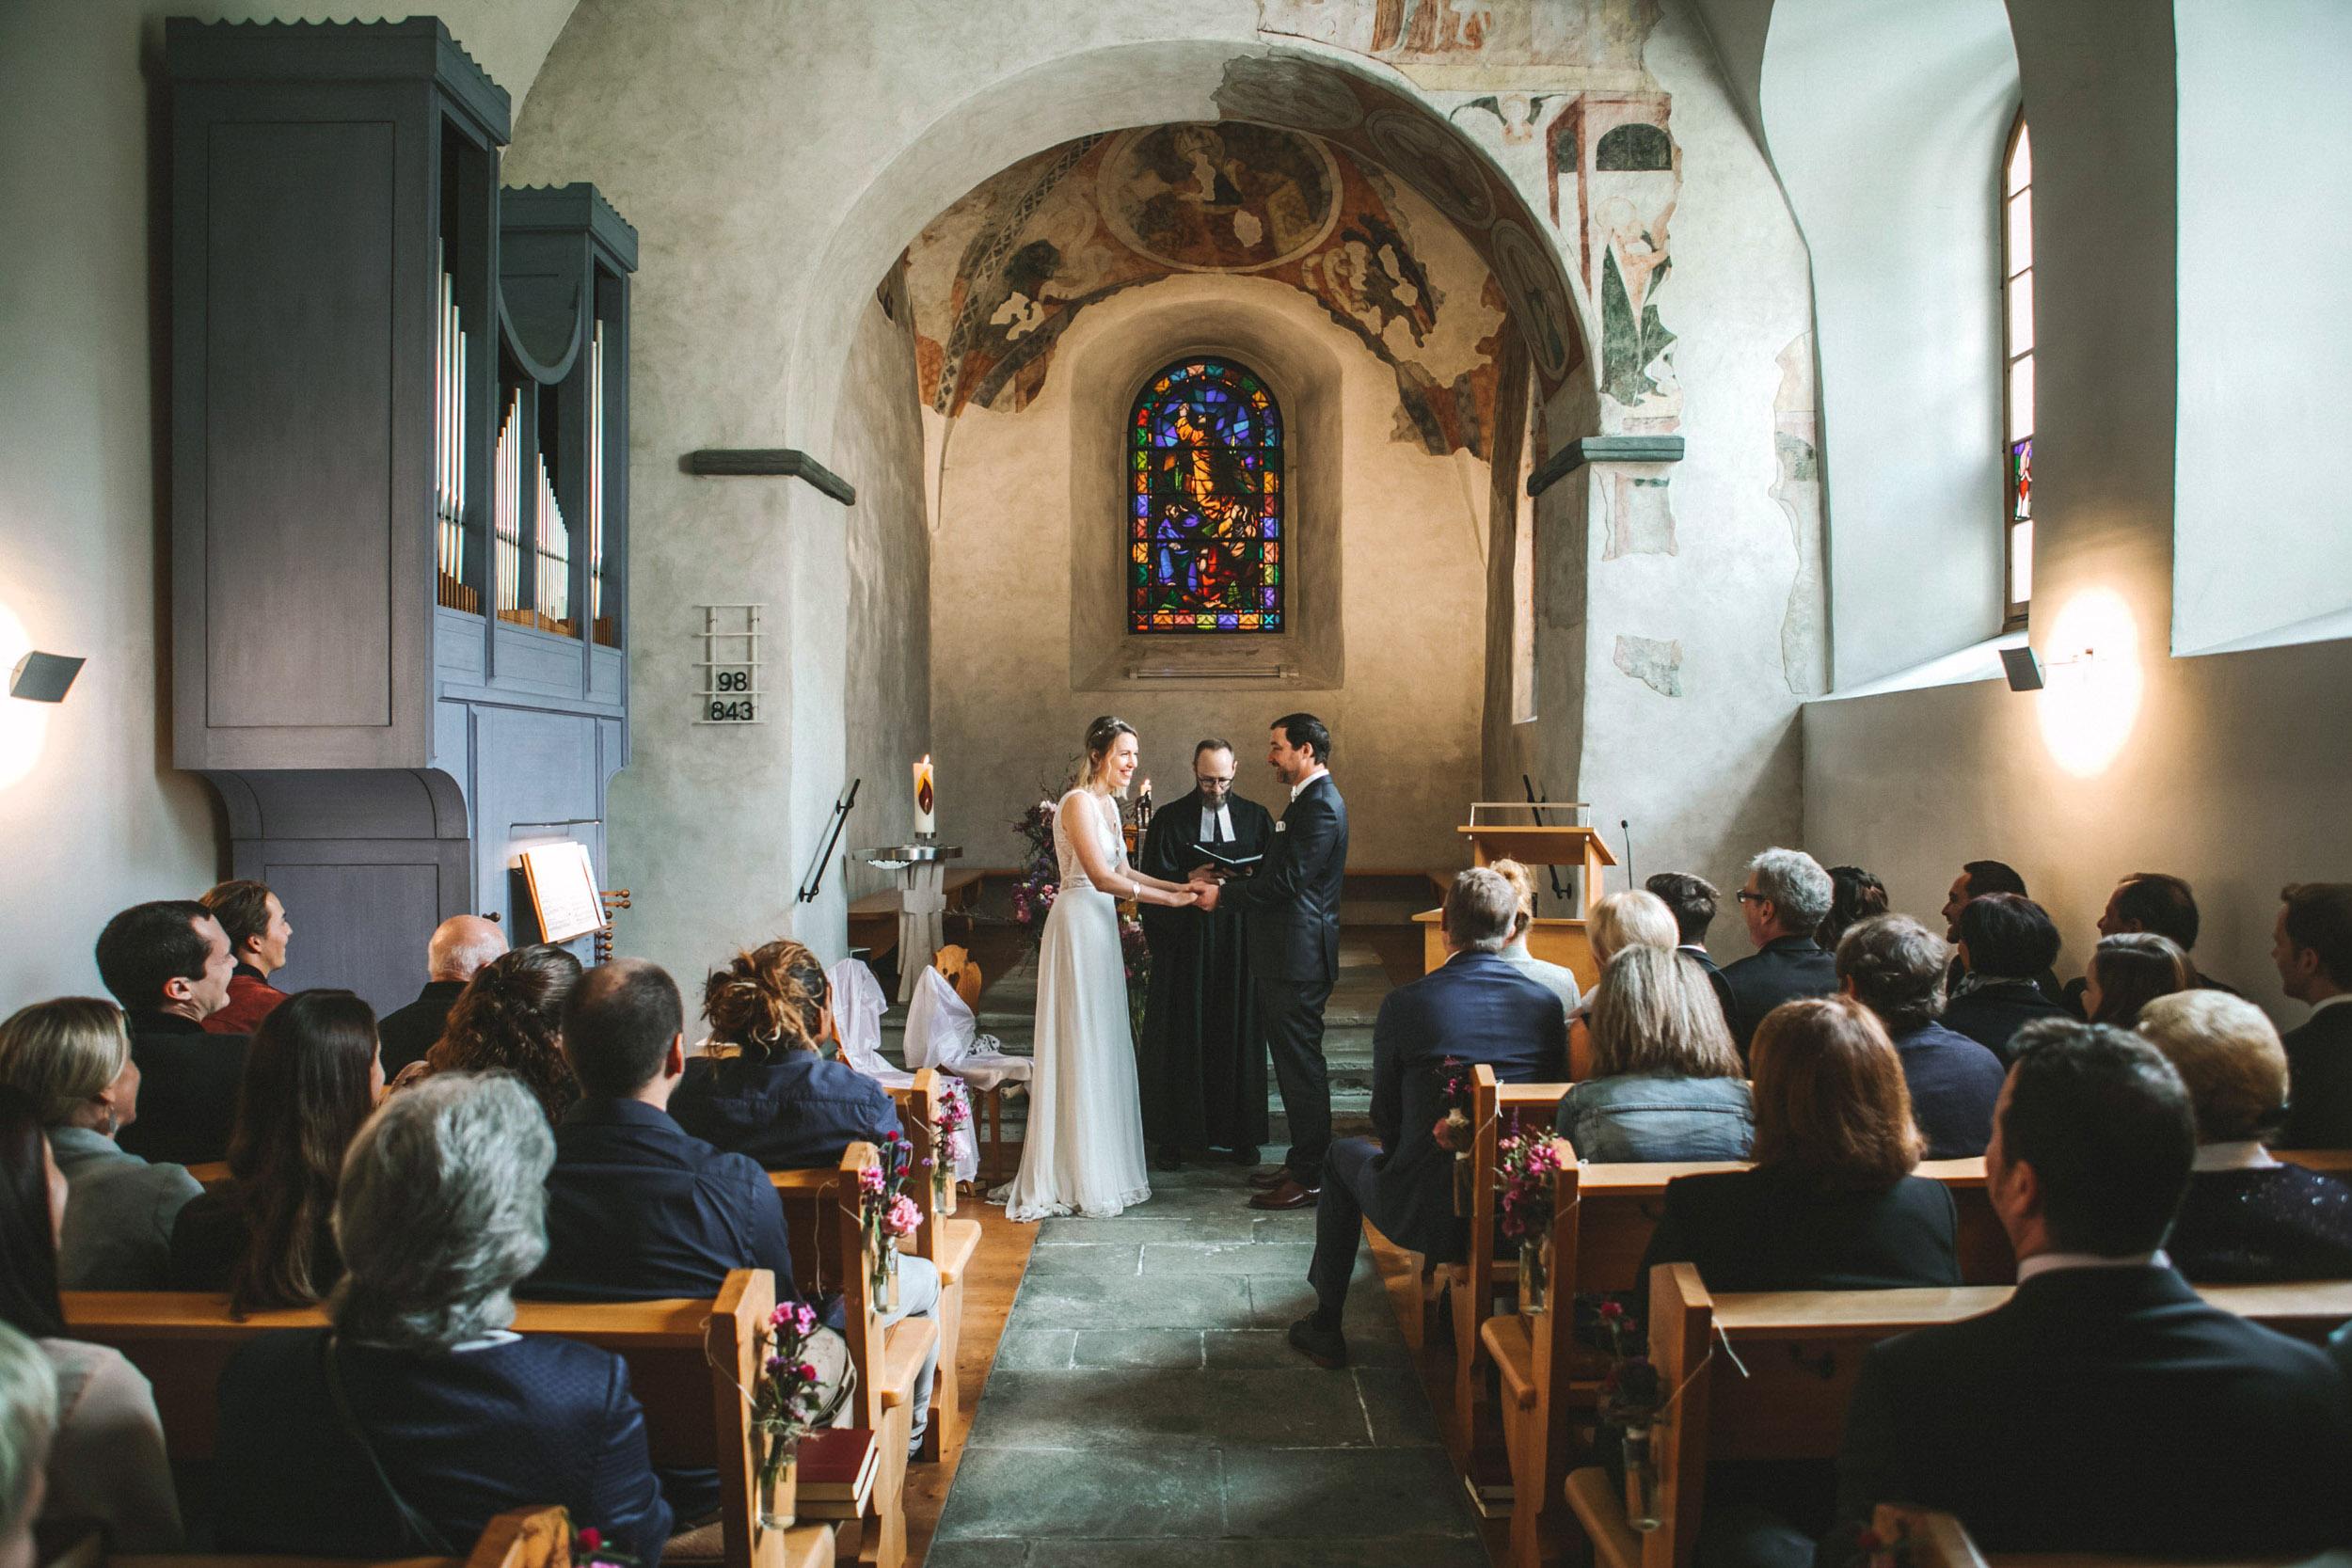 hochzeitsfotografie-schweiz_wedding-photographer-switzerland-europe_Bendik-Photography-043